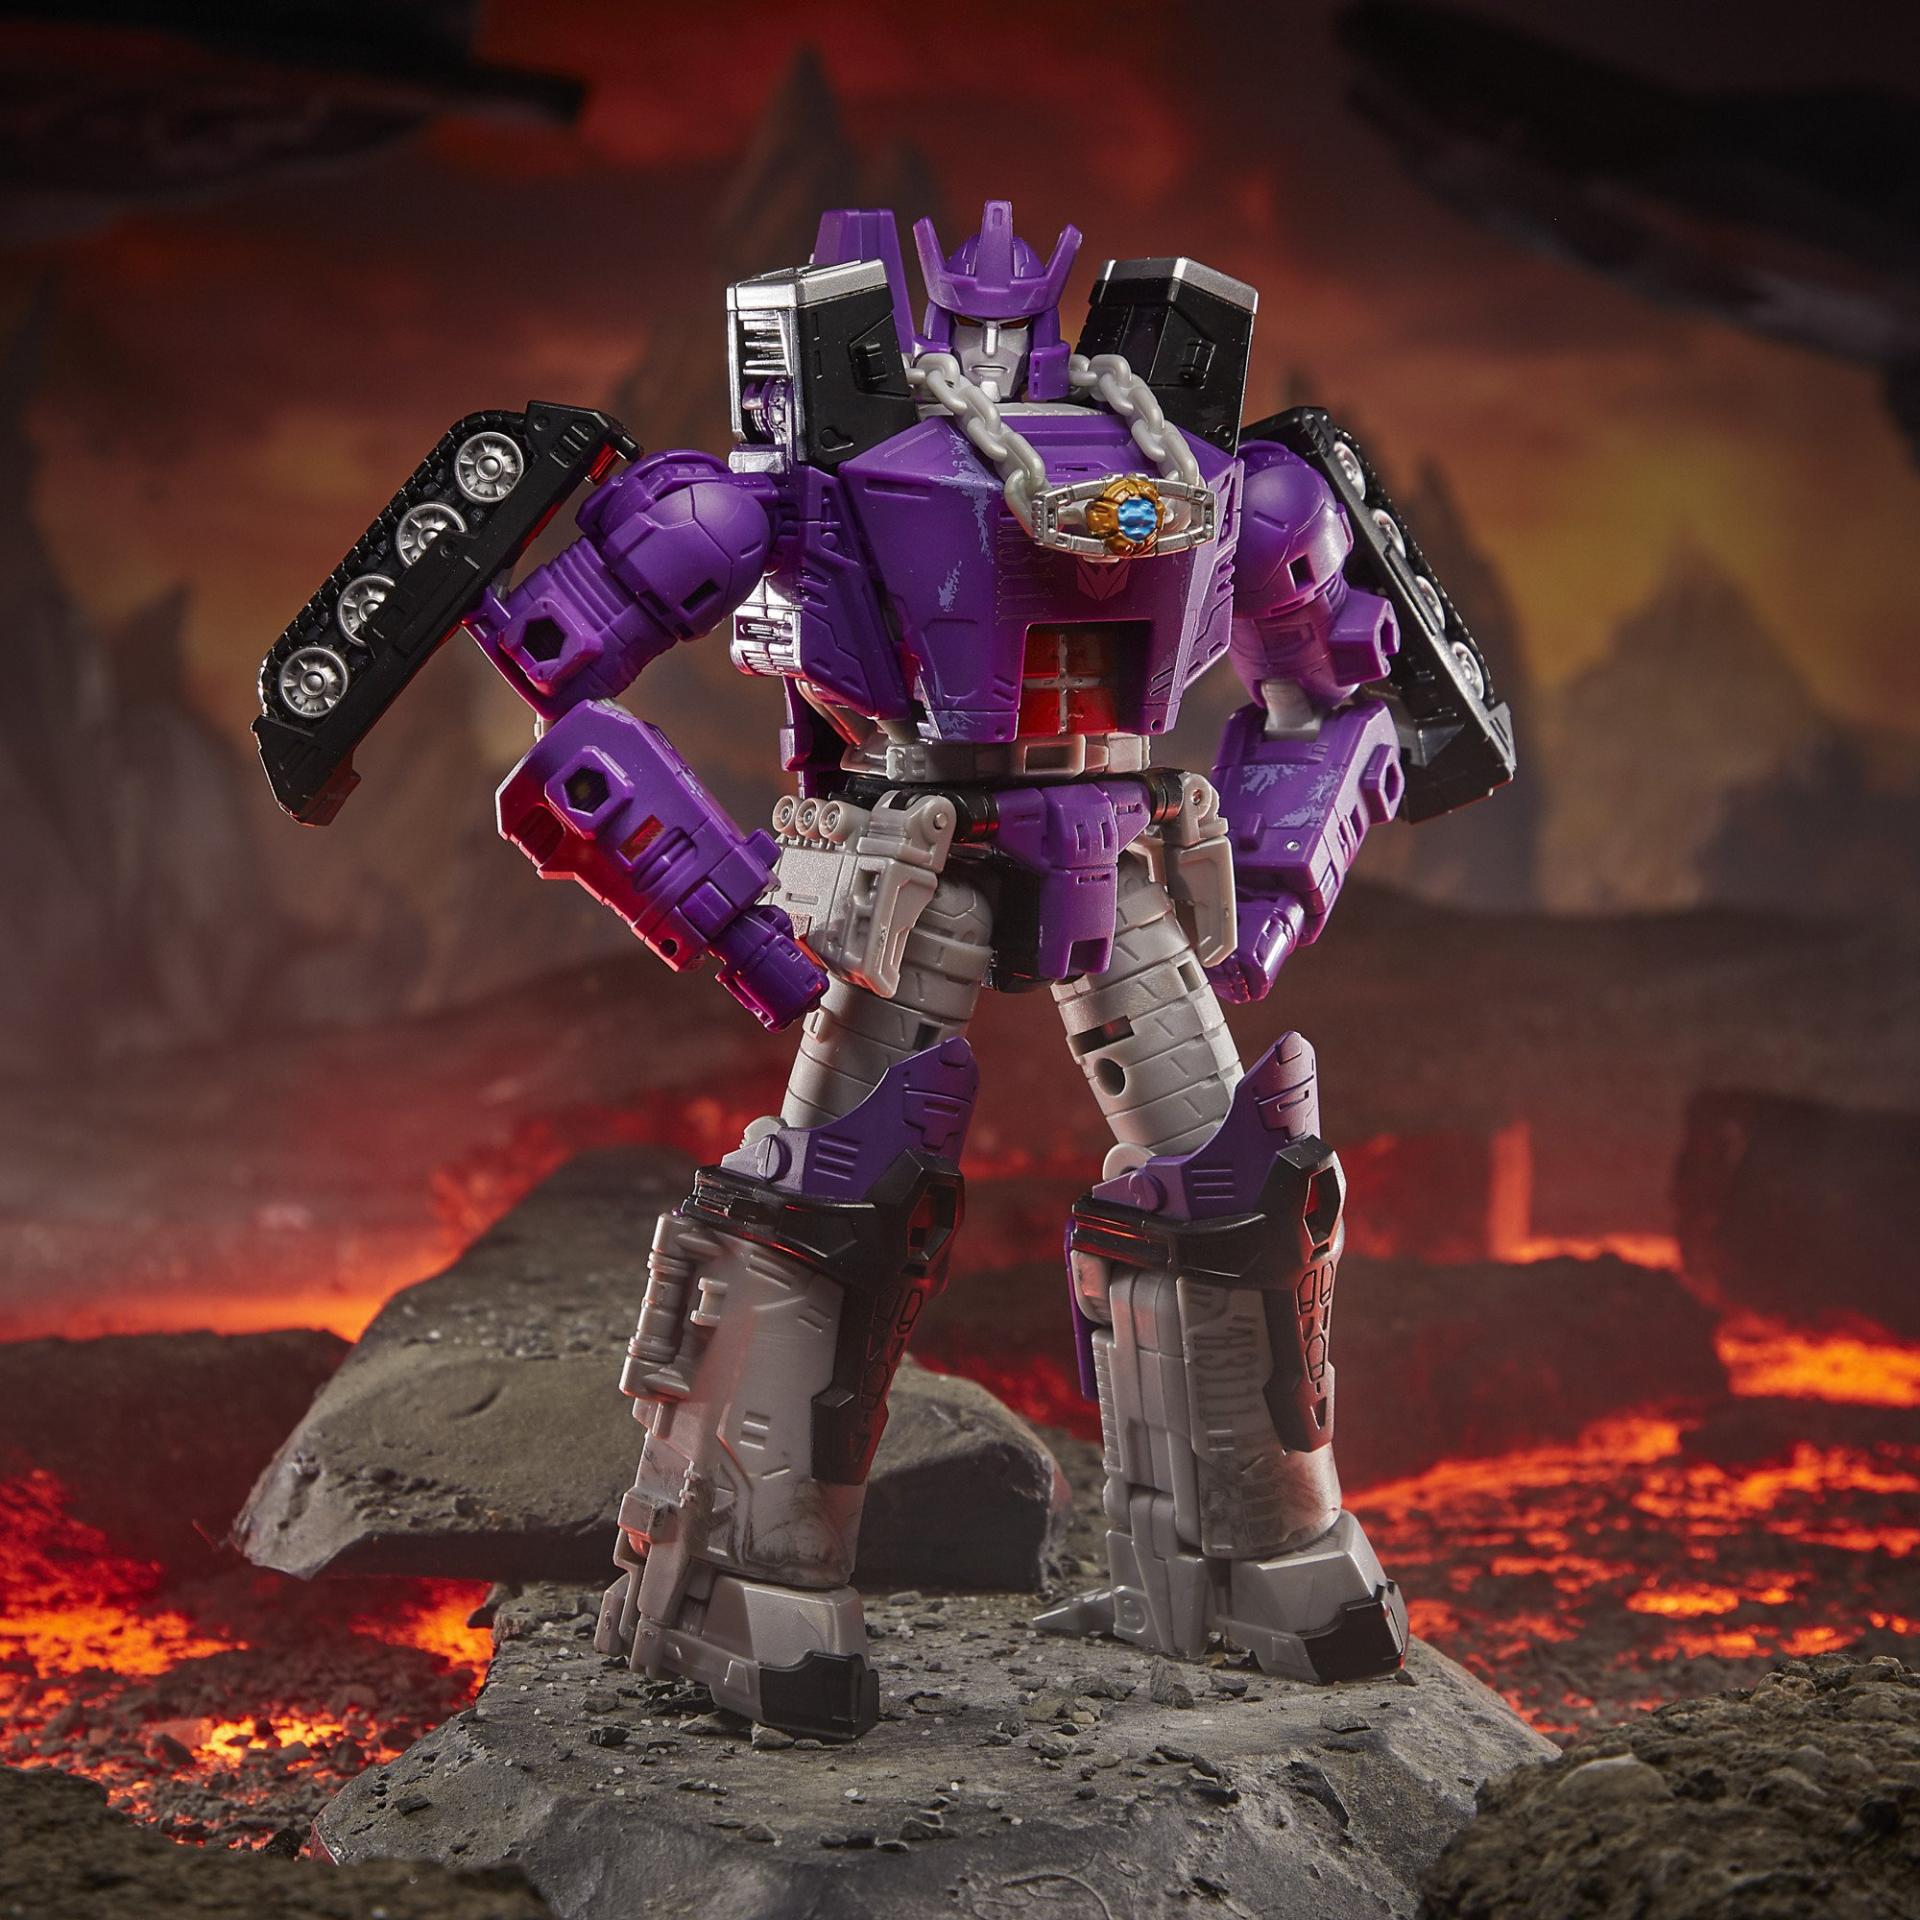 Transformers hasbro generations war for cybertron kingdom leader wfc k28 galvatron6